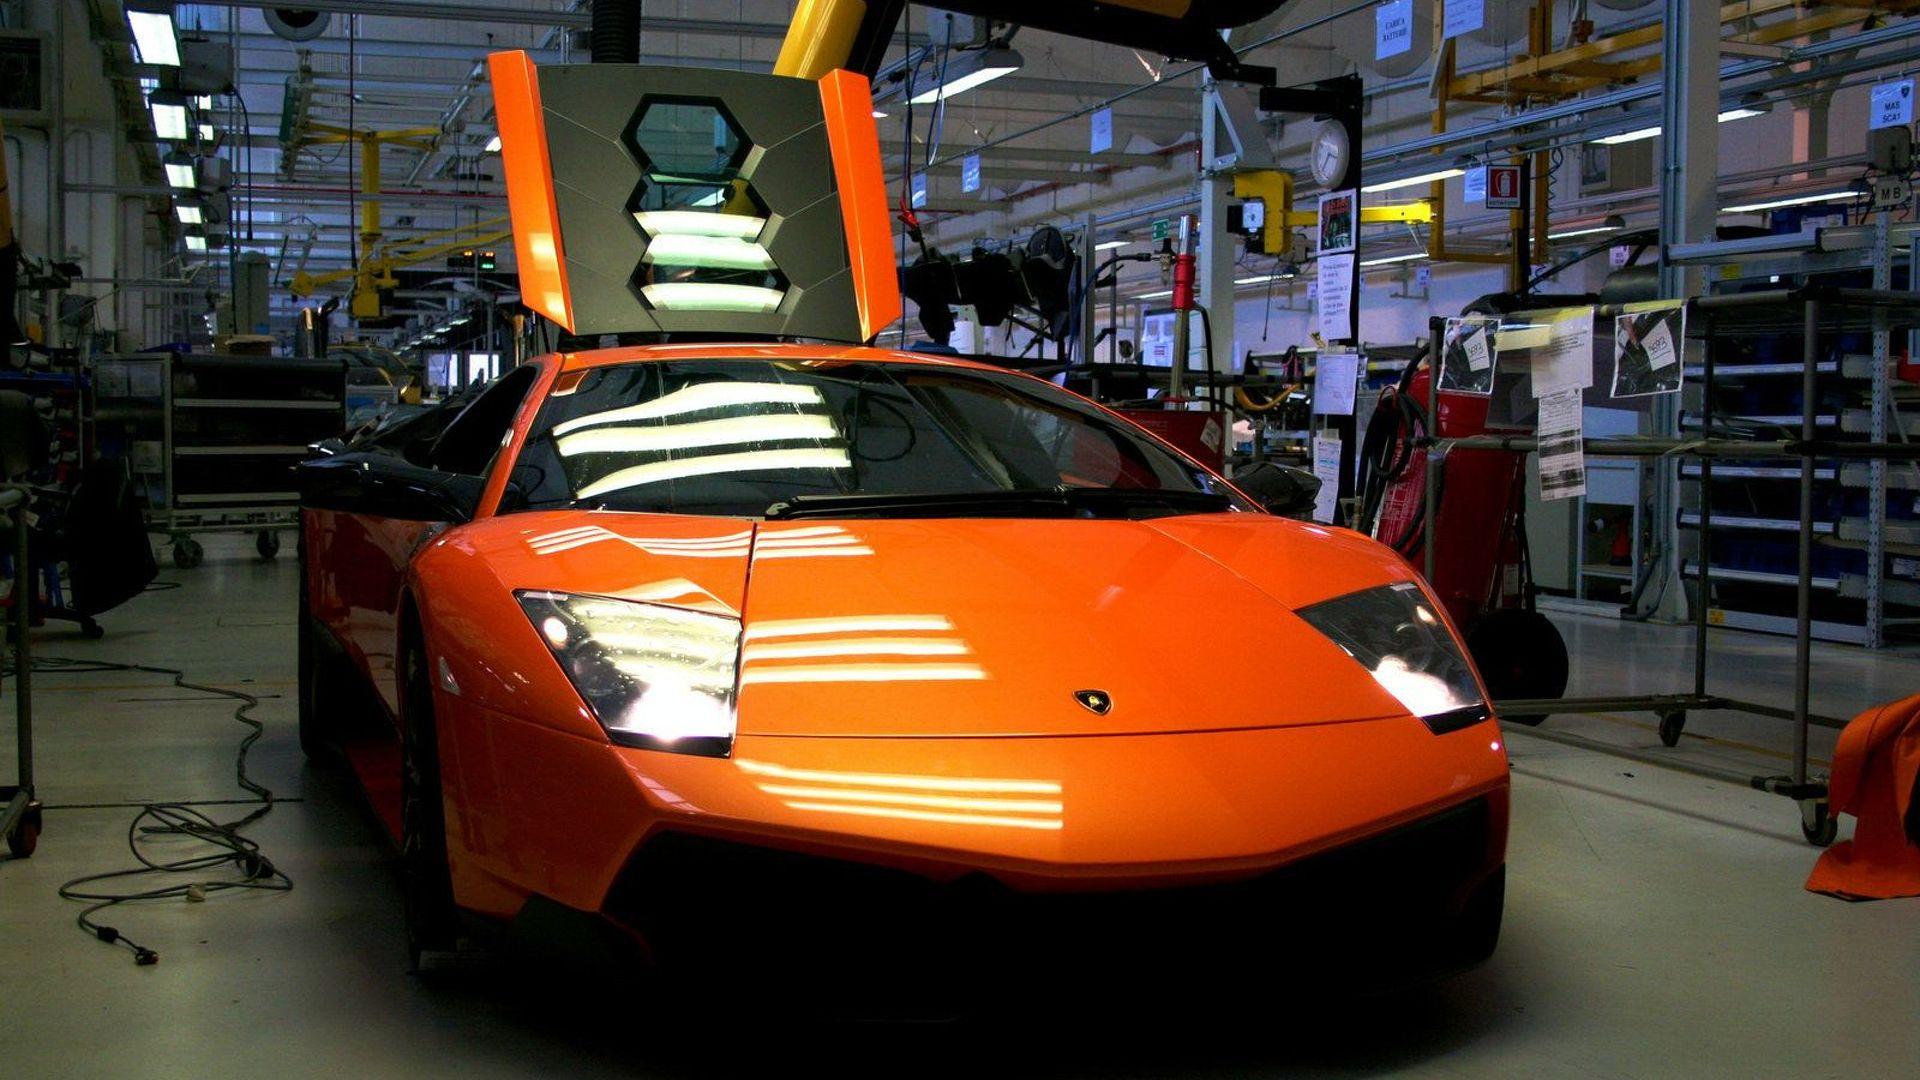 Lamborghini LP670-4 SV Factory Build on National Geographics TV Show [Video]